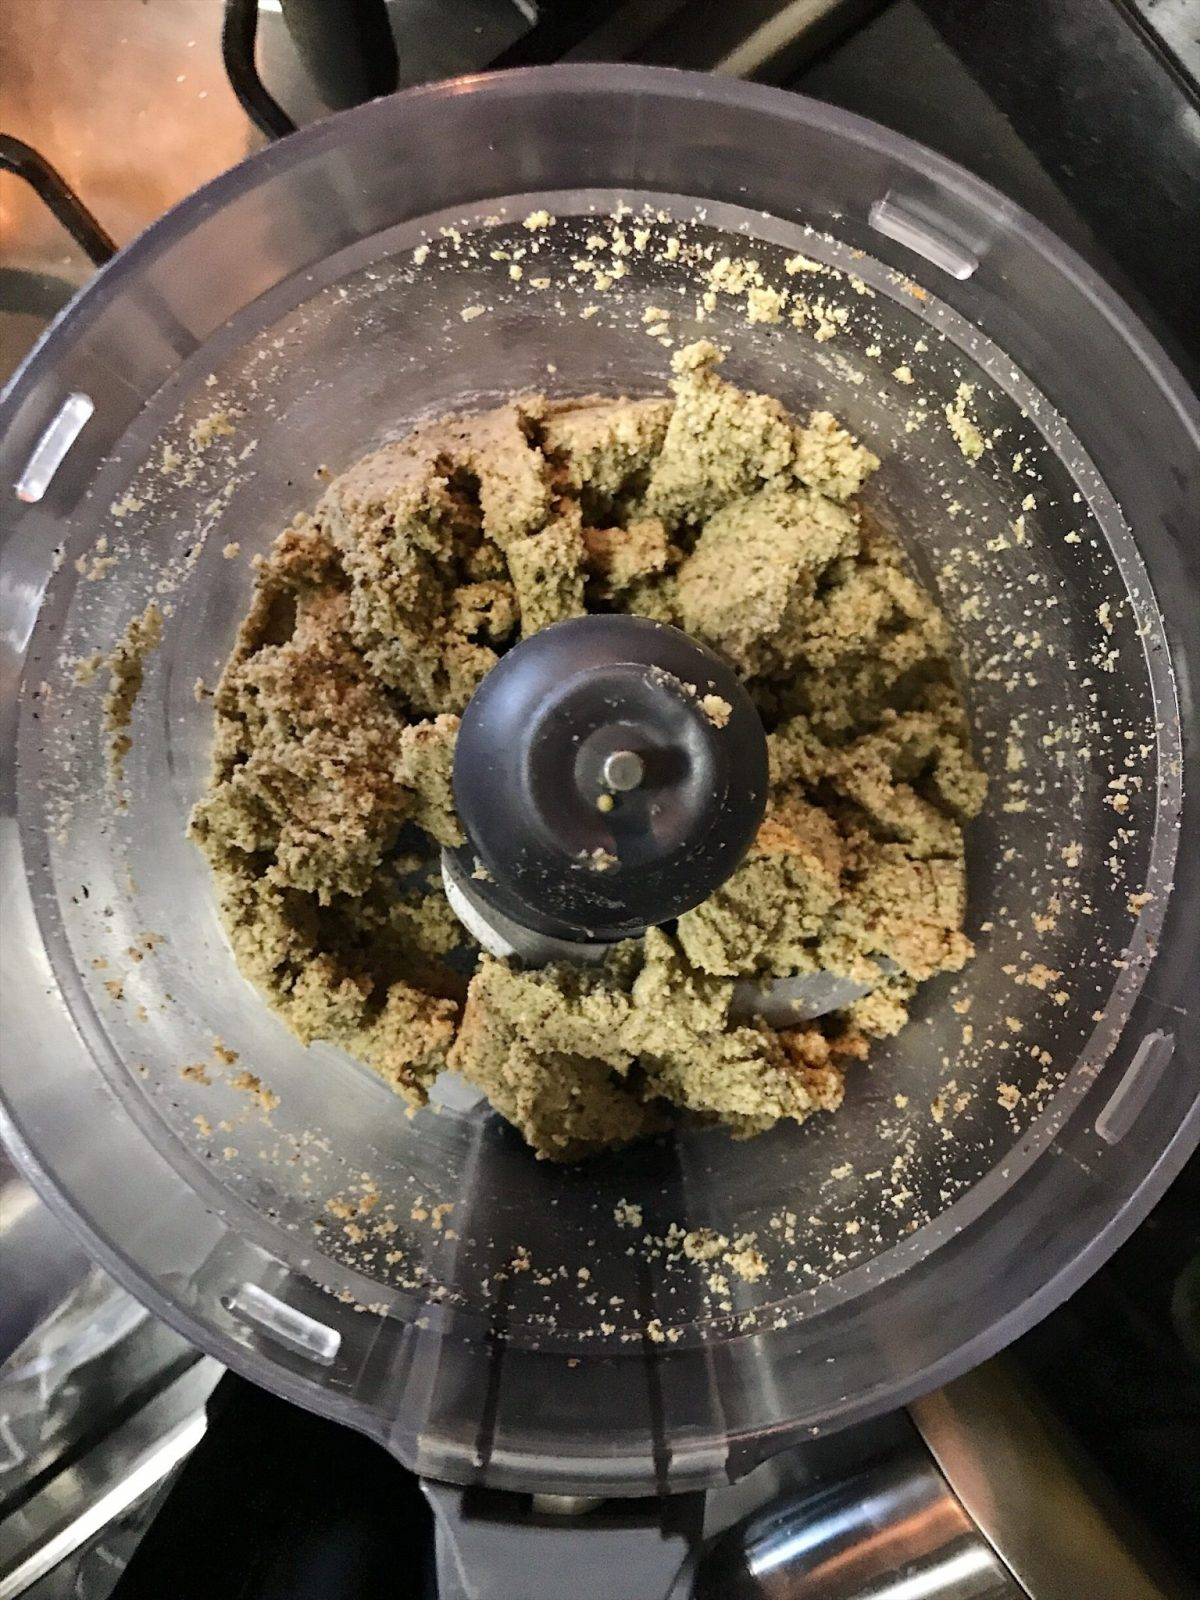 Homemade All nut butter recipe